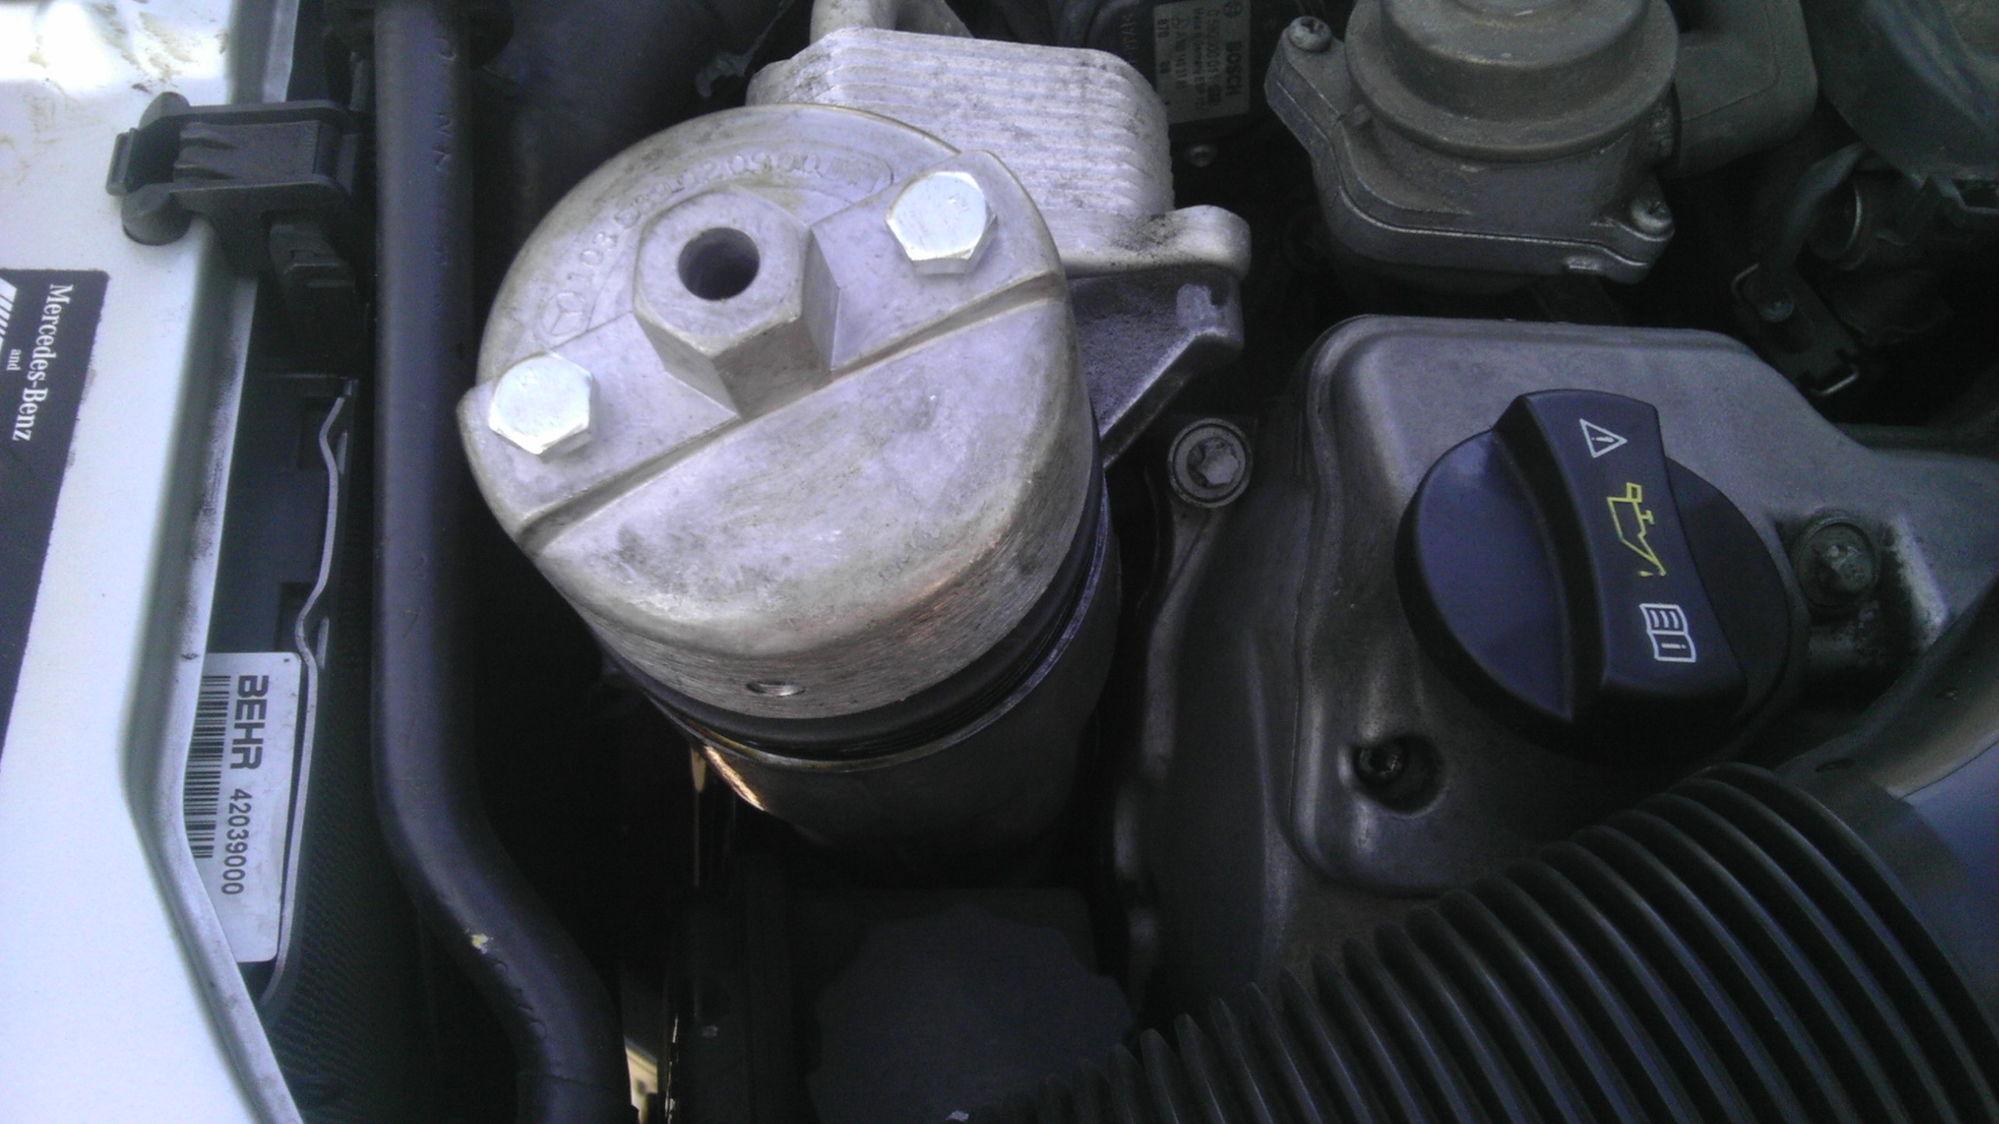 C43 oil change mobil 1 formula m 5w 40 amg engine for Mercedes benz engine oil recommendations